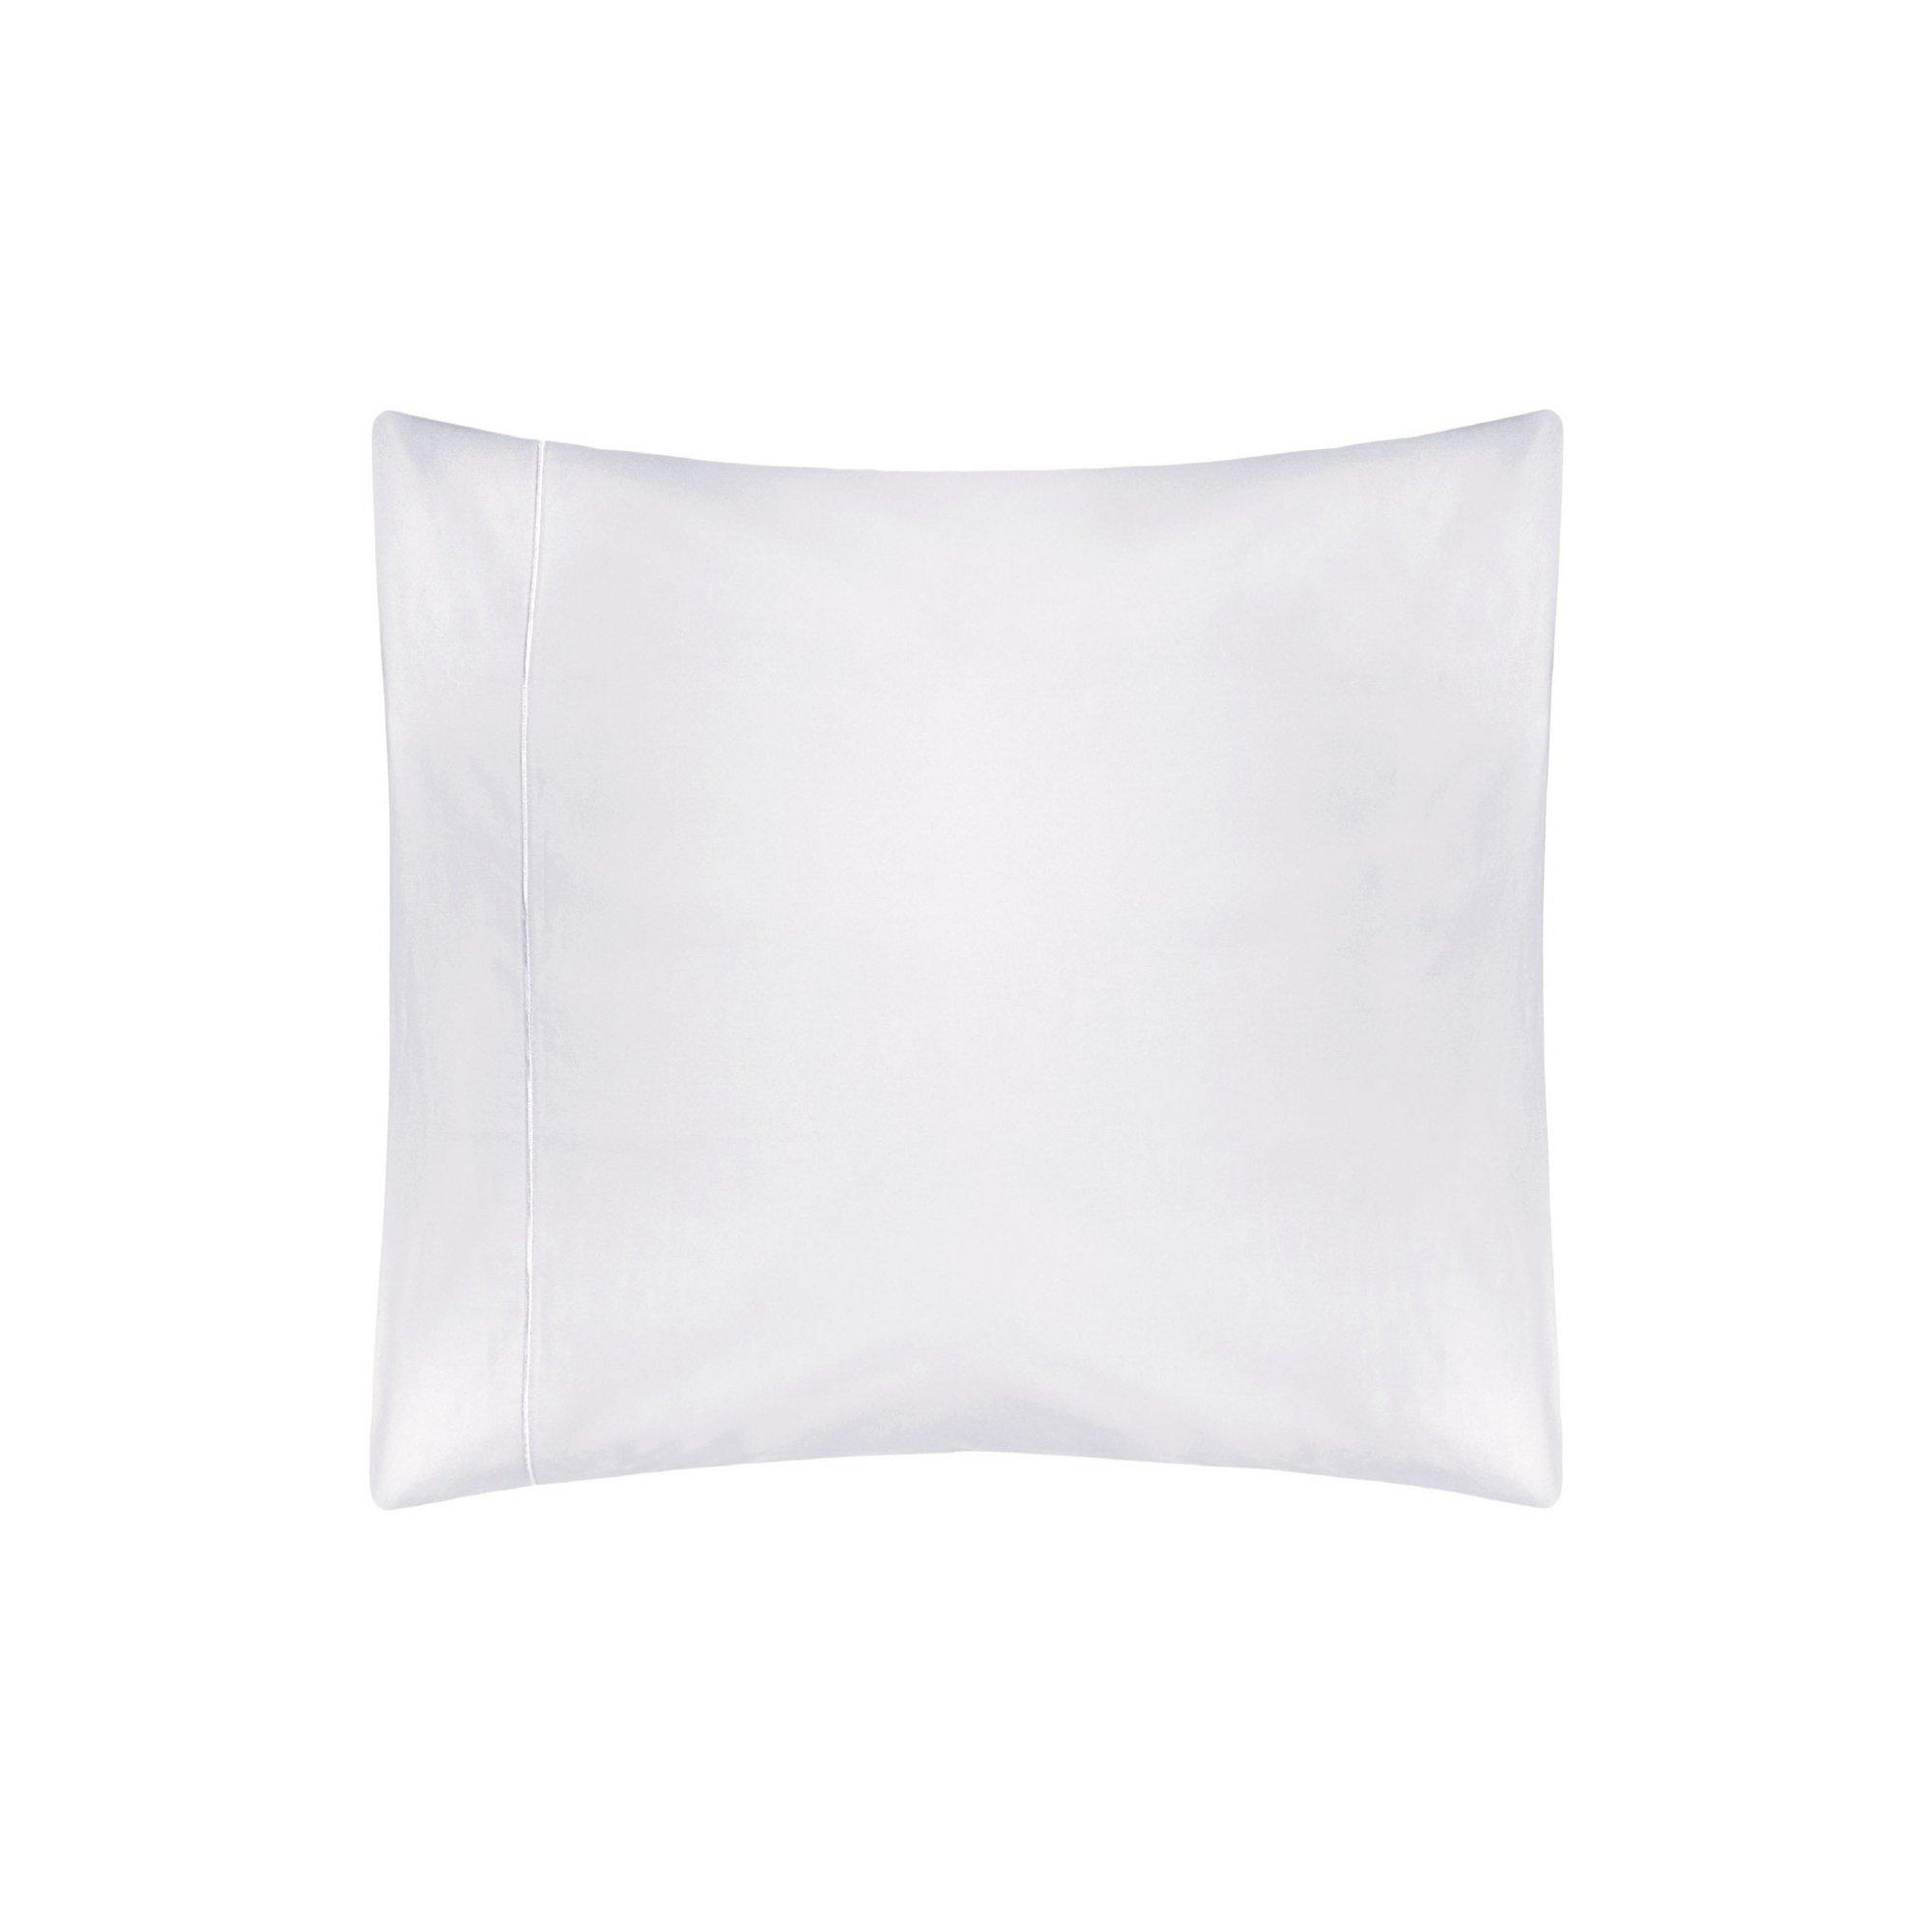 Belledorm 400 Count Egyptian Cotton Continental Pillowcase